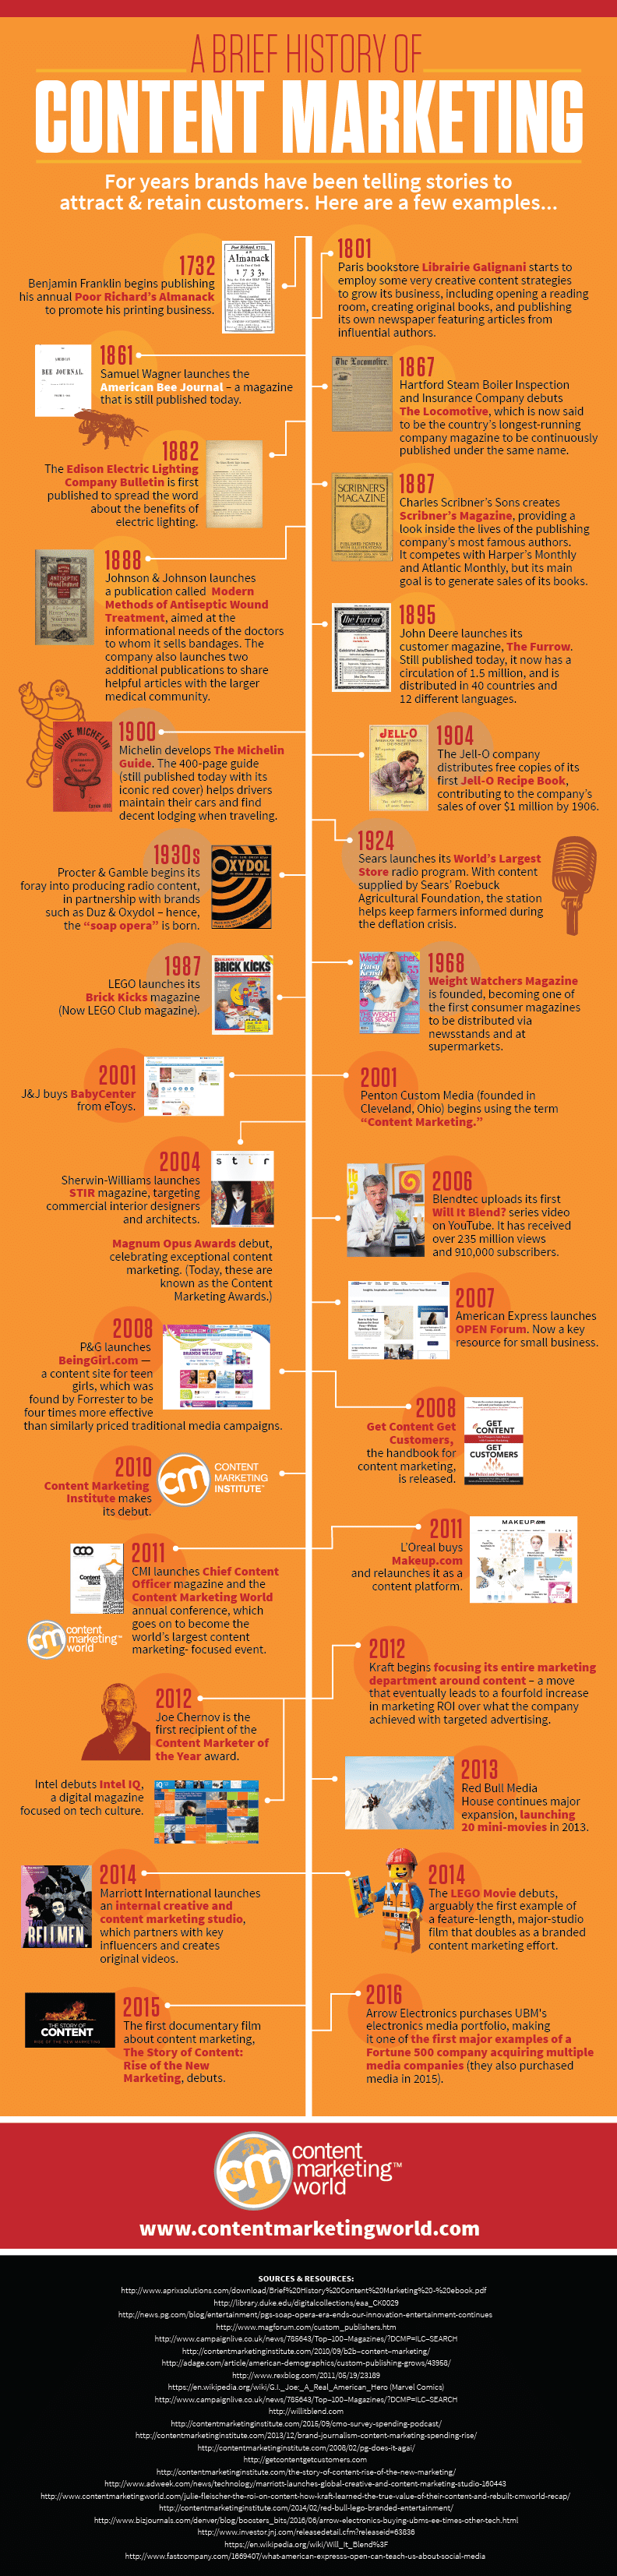 Histoire du marketing de contenu